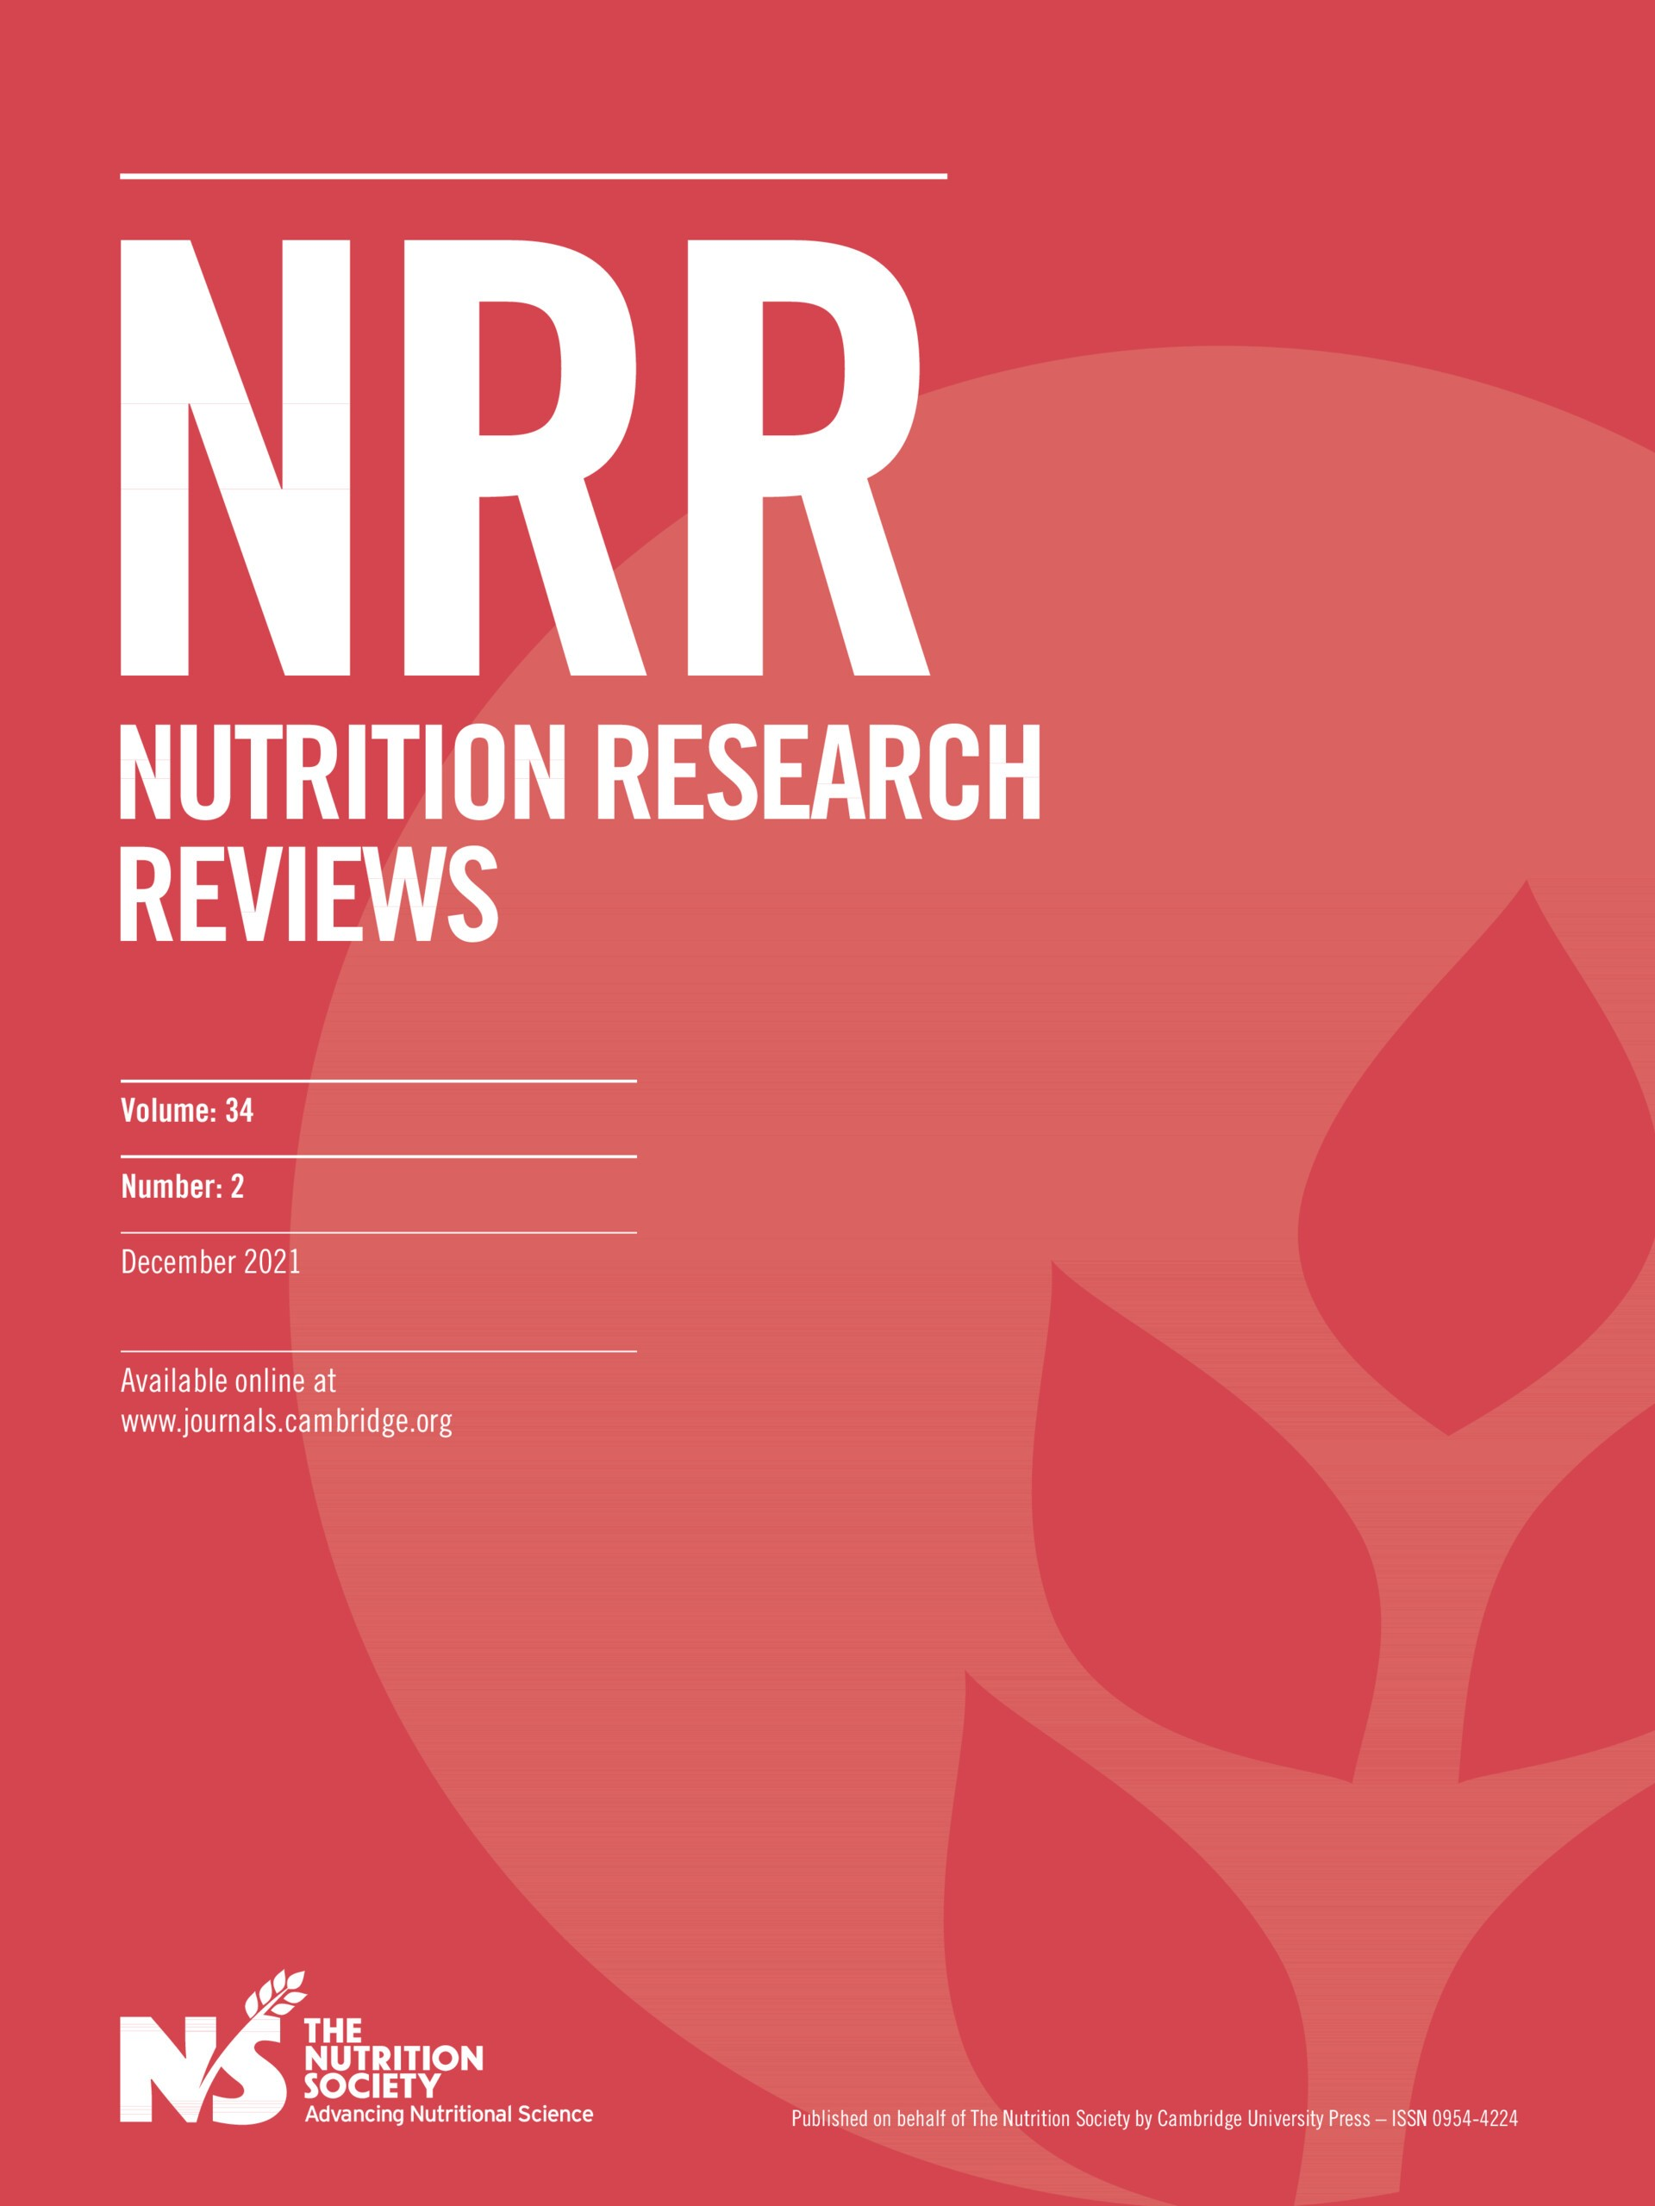 Nutrition Research Reviews | Cambridge Core